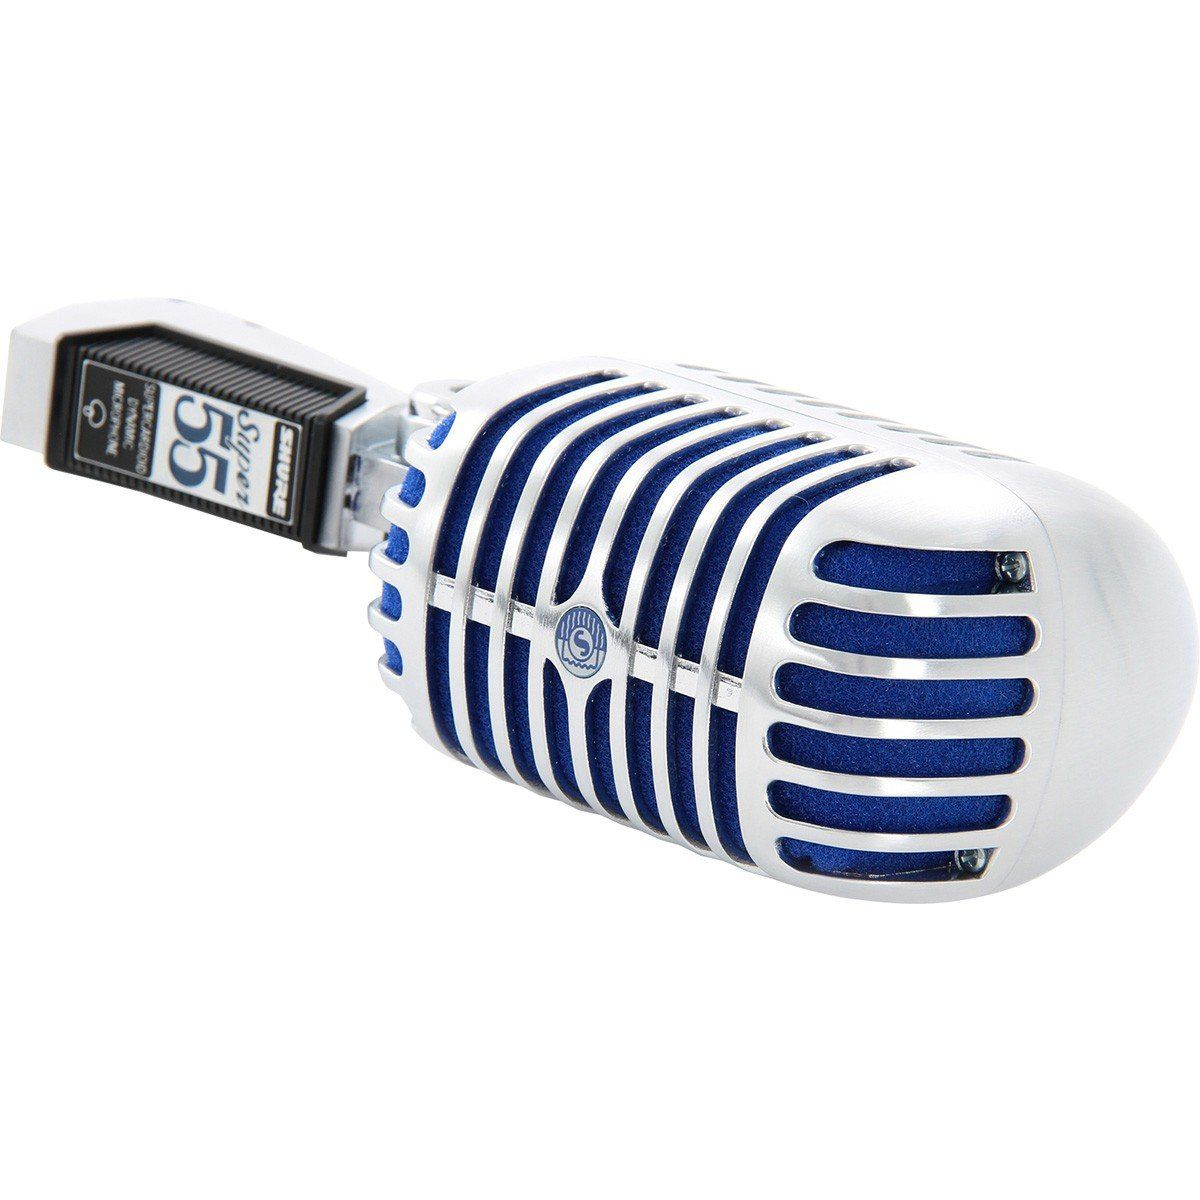 Shure Super-55 Microfone Dinâmico Supercardióide Shure Super 55 para Palco